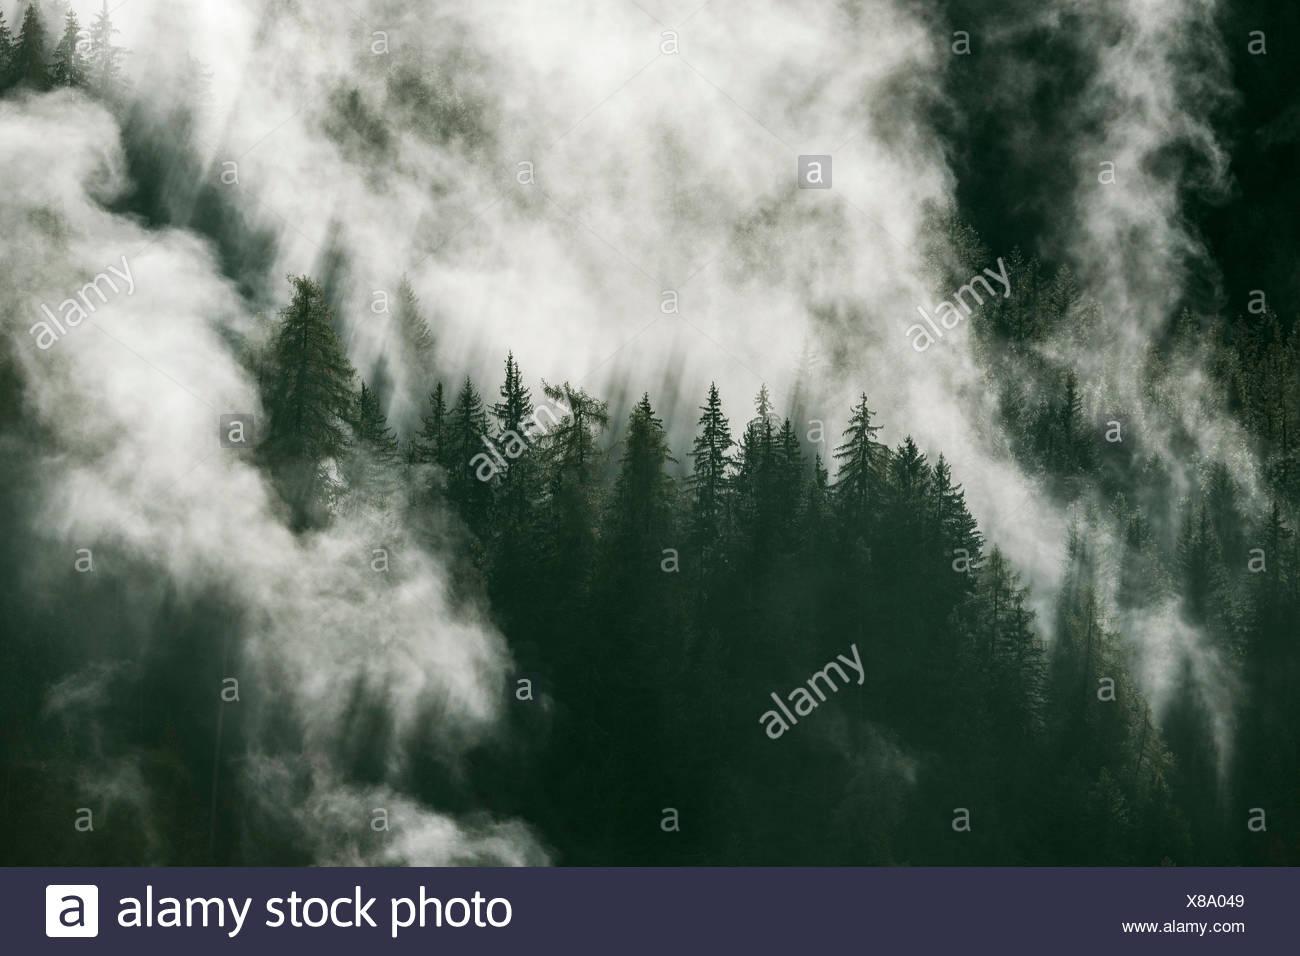 Waft of mist over forest of coniferous trees, coniferous forest, Prägraten am Großvenediger, Virgental, East Tyrol, Austria - Stock Image